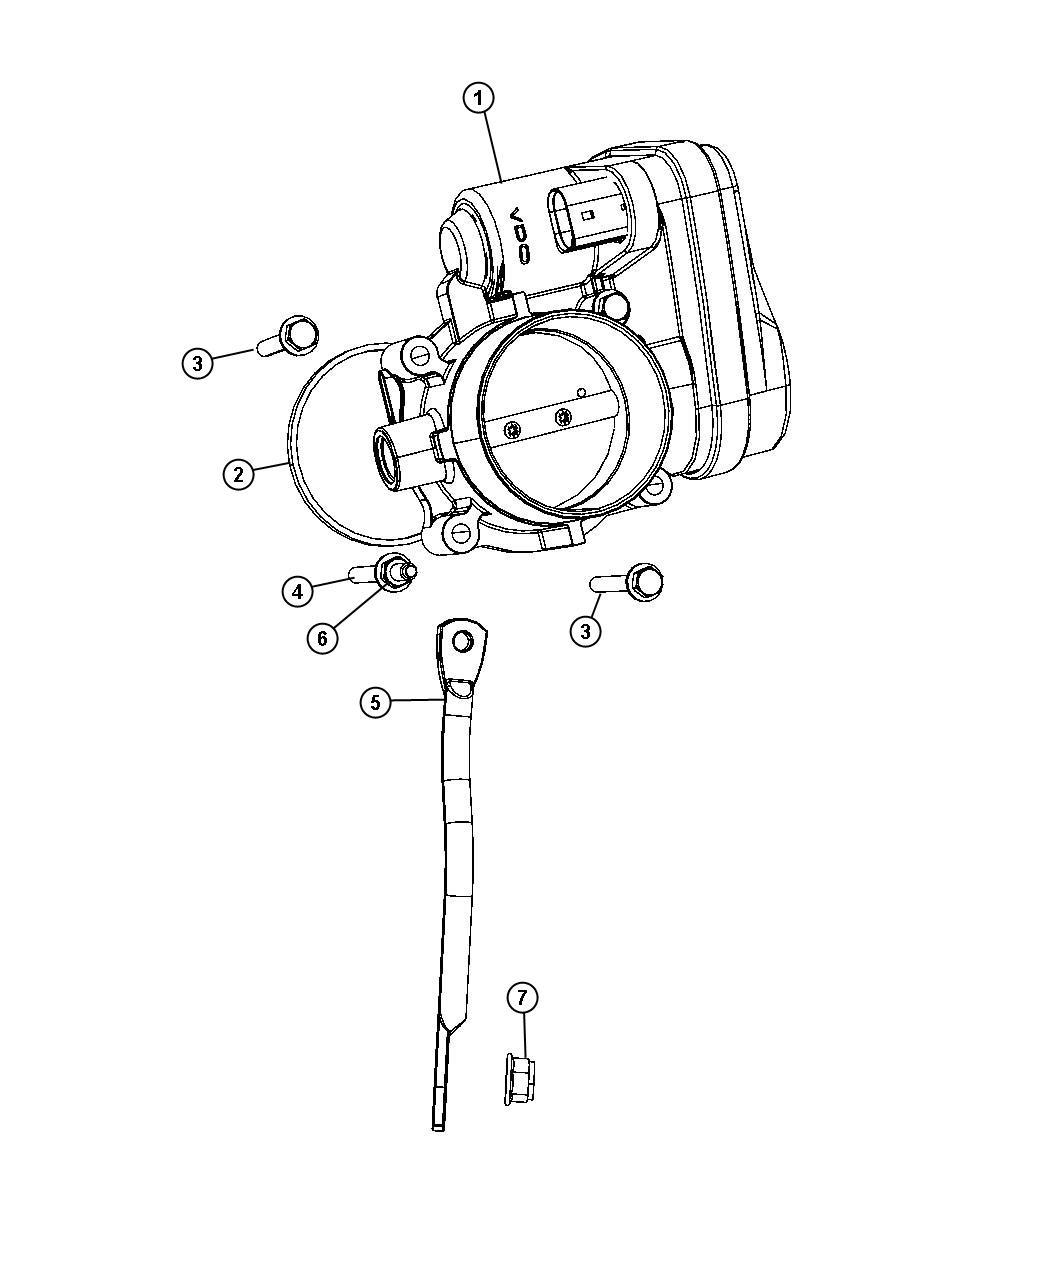 2008    Chrysler    Sebring    Throttle       body    Intake  manifold